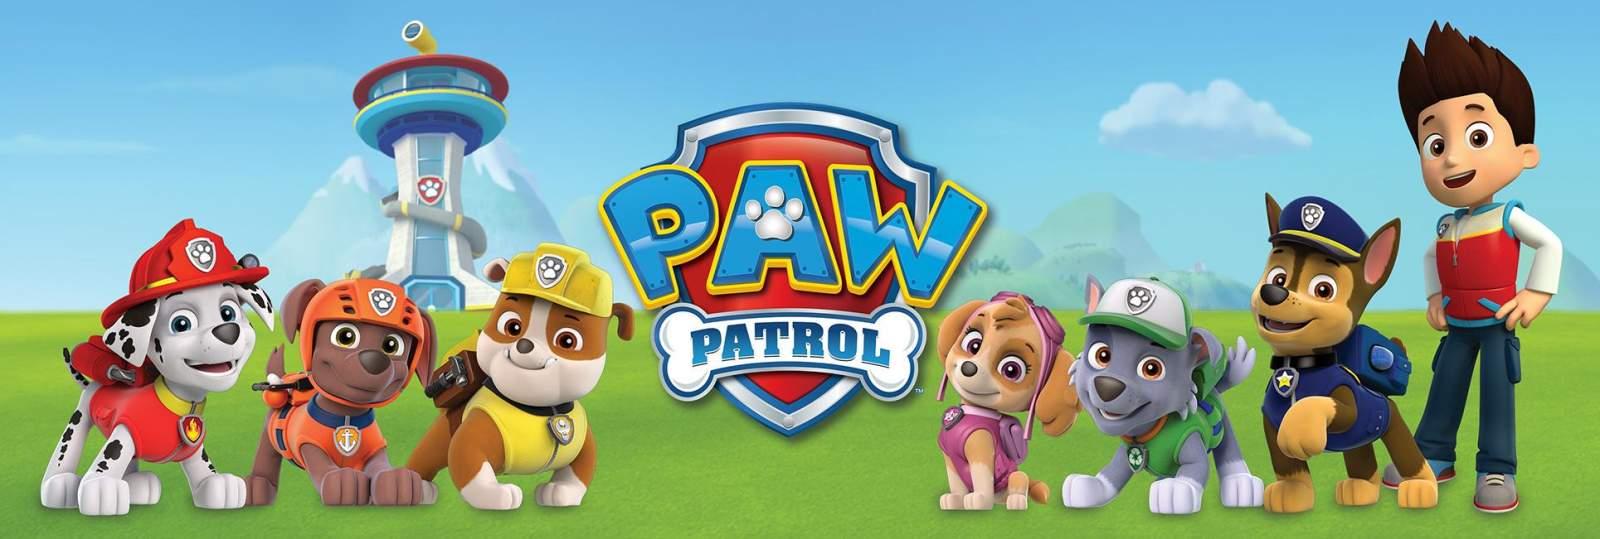 banner patrulla 2